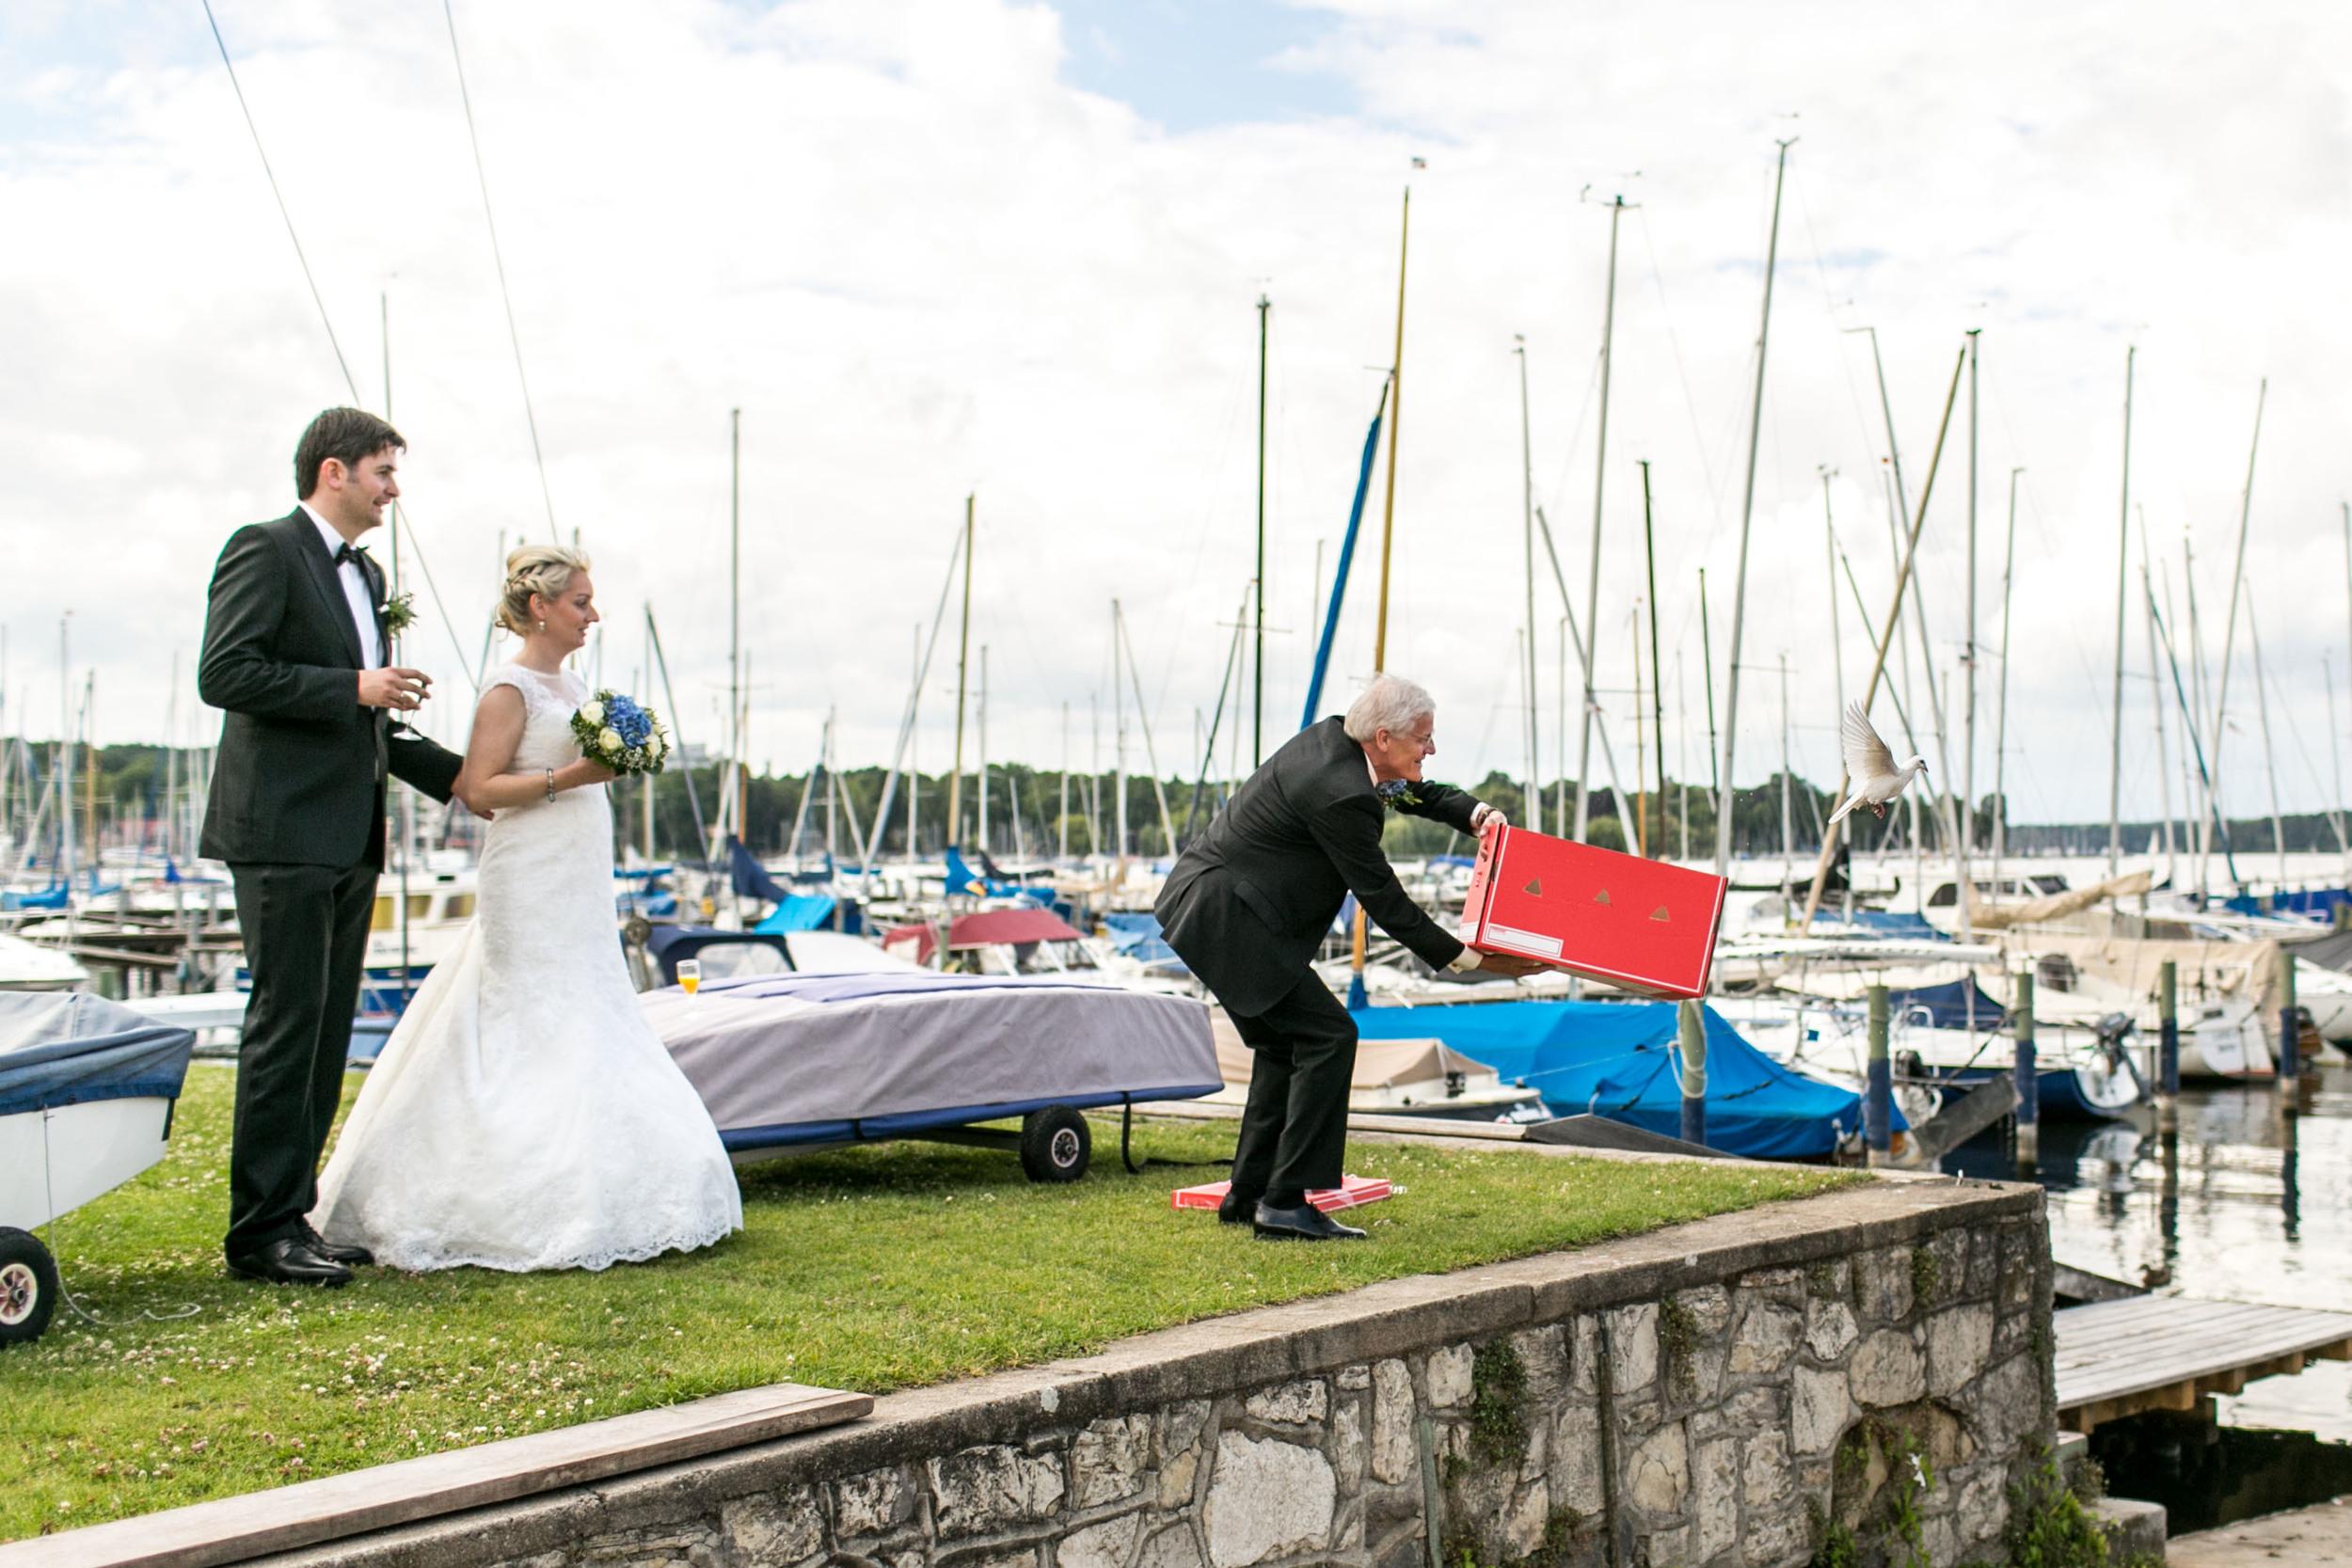 Hochzeitsfotografie Berlin_Fran Burrows Fotografie_27.jpg